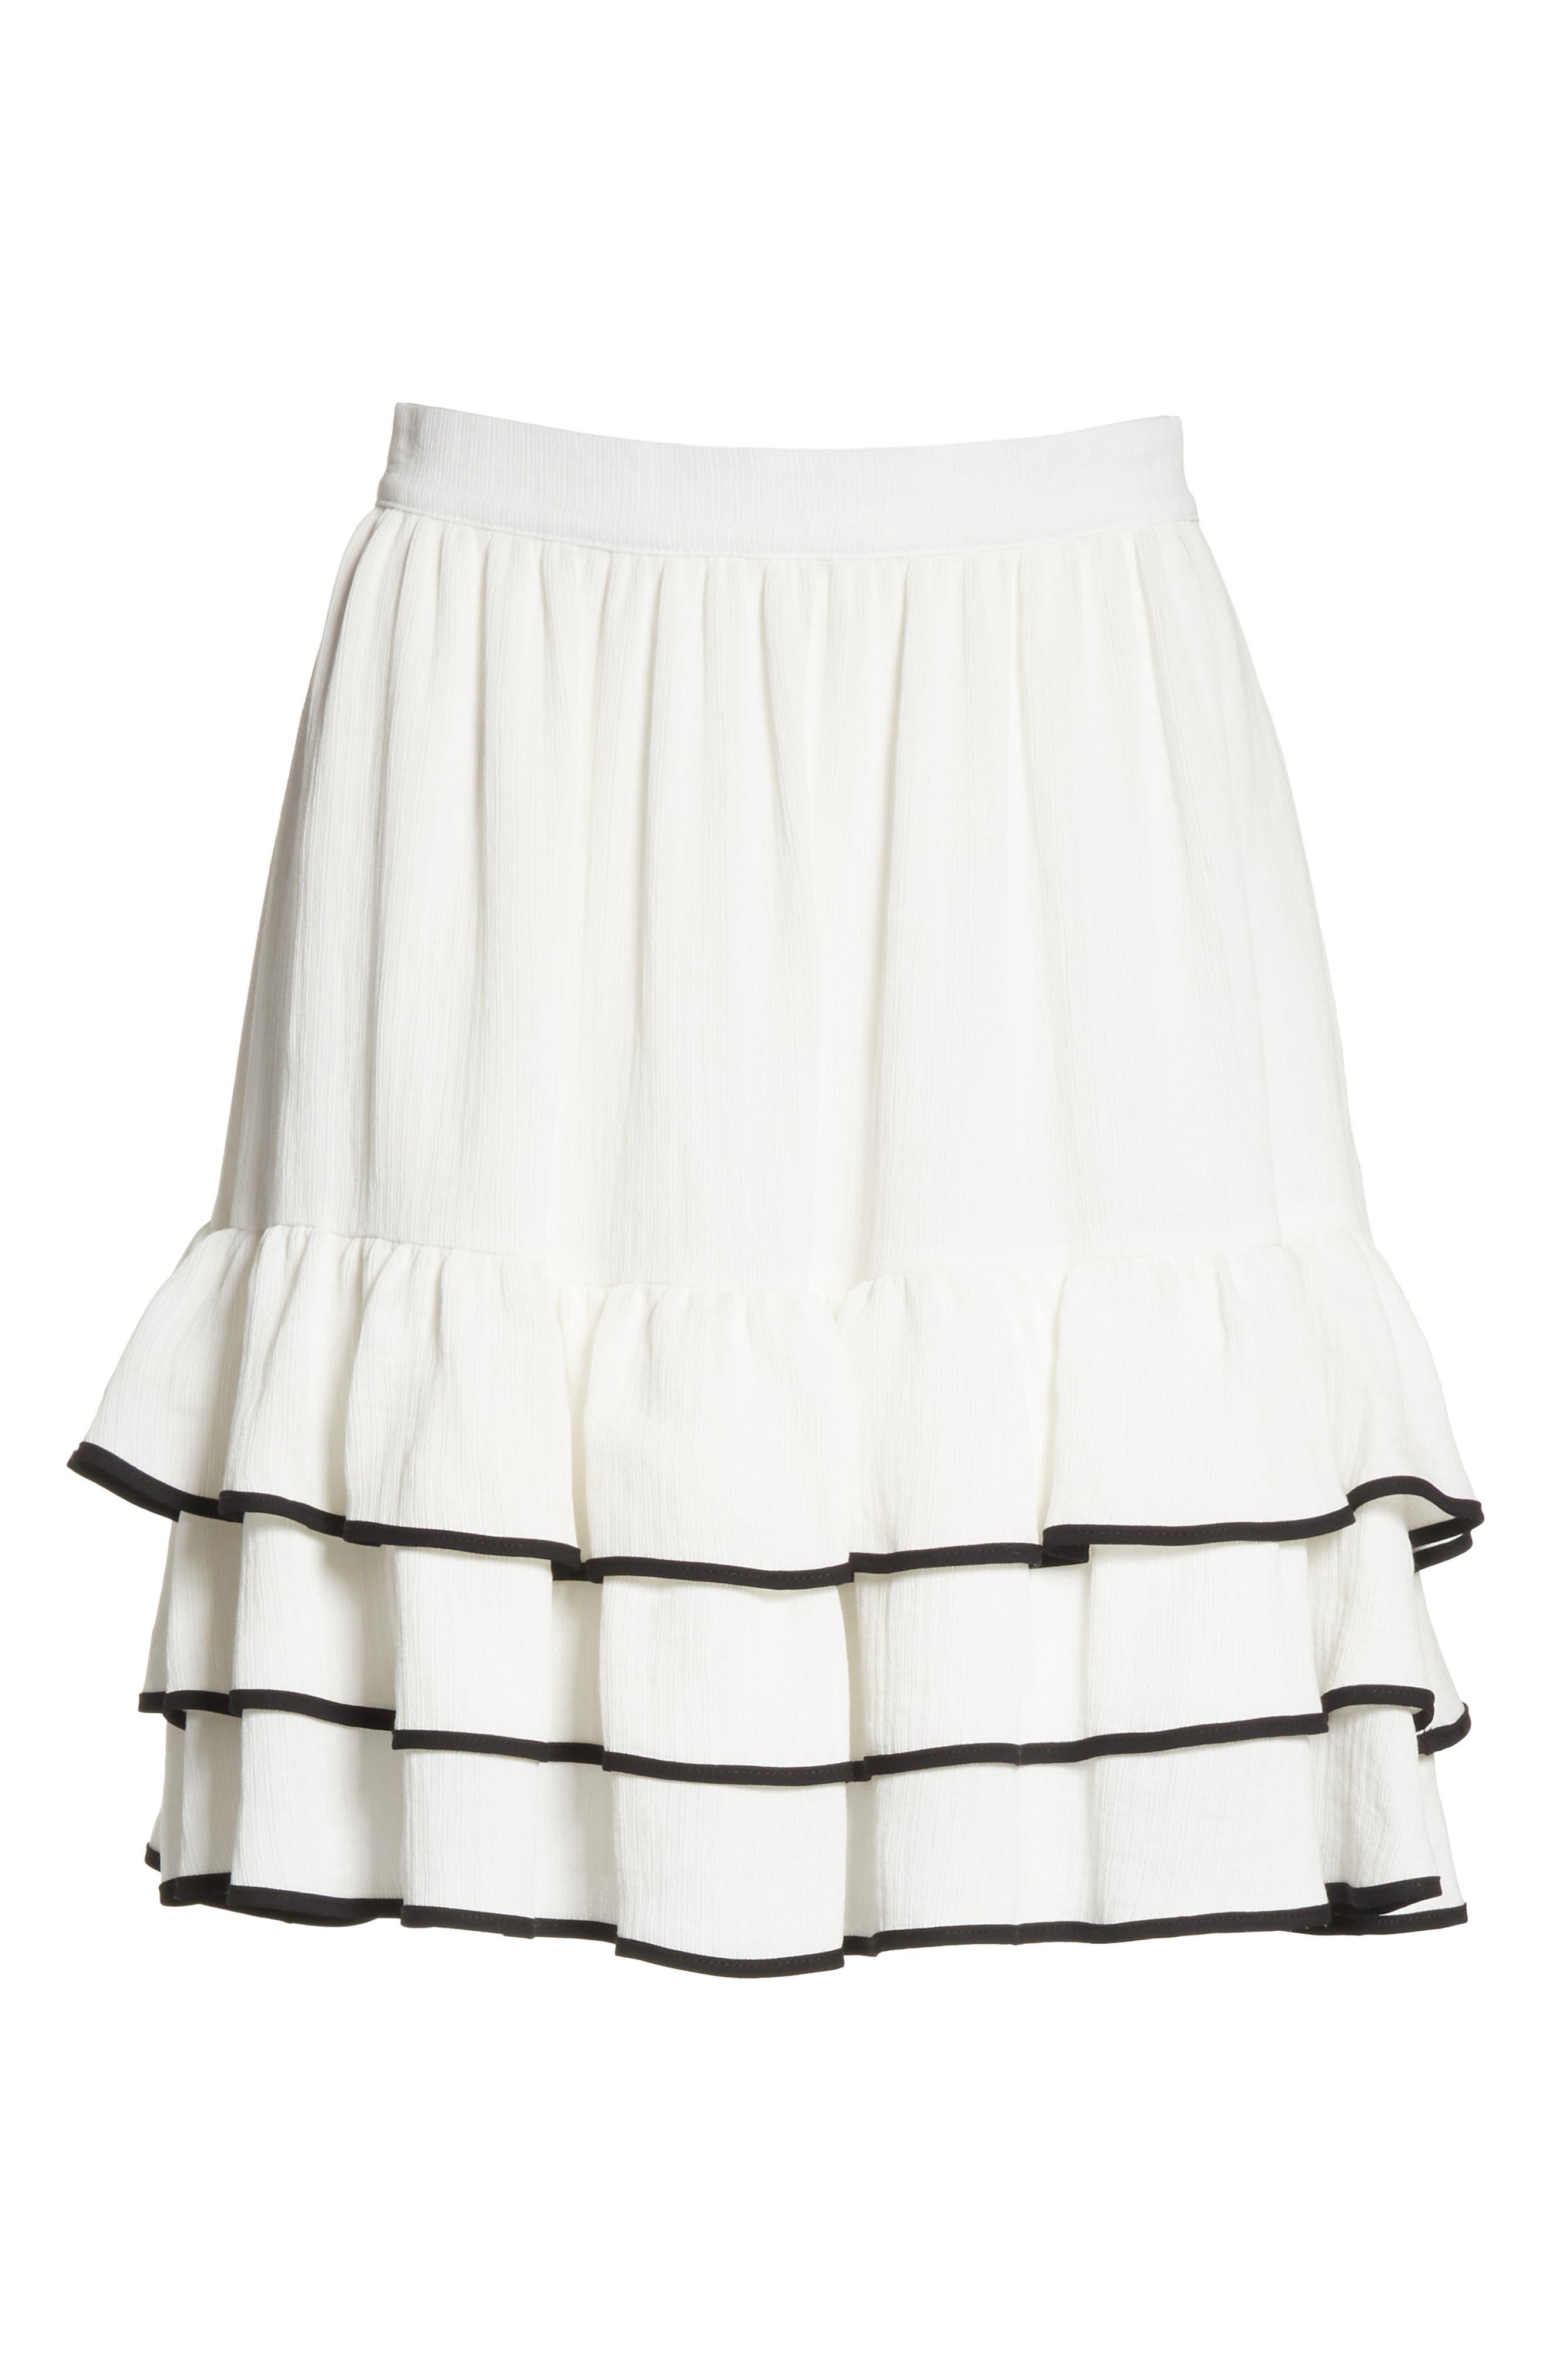 Prose & Poetry Carice Ruffle Miniskirt,                             Alternate thumbnail 6, color,                             Alabaster